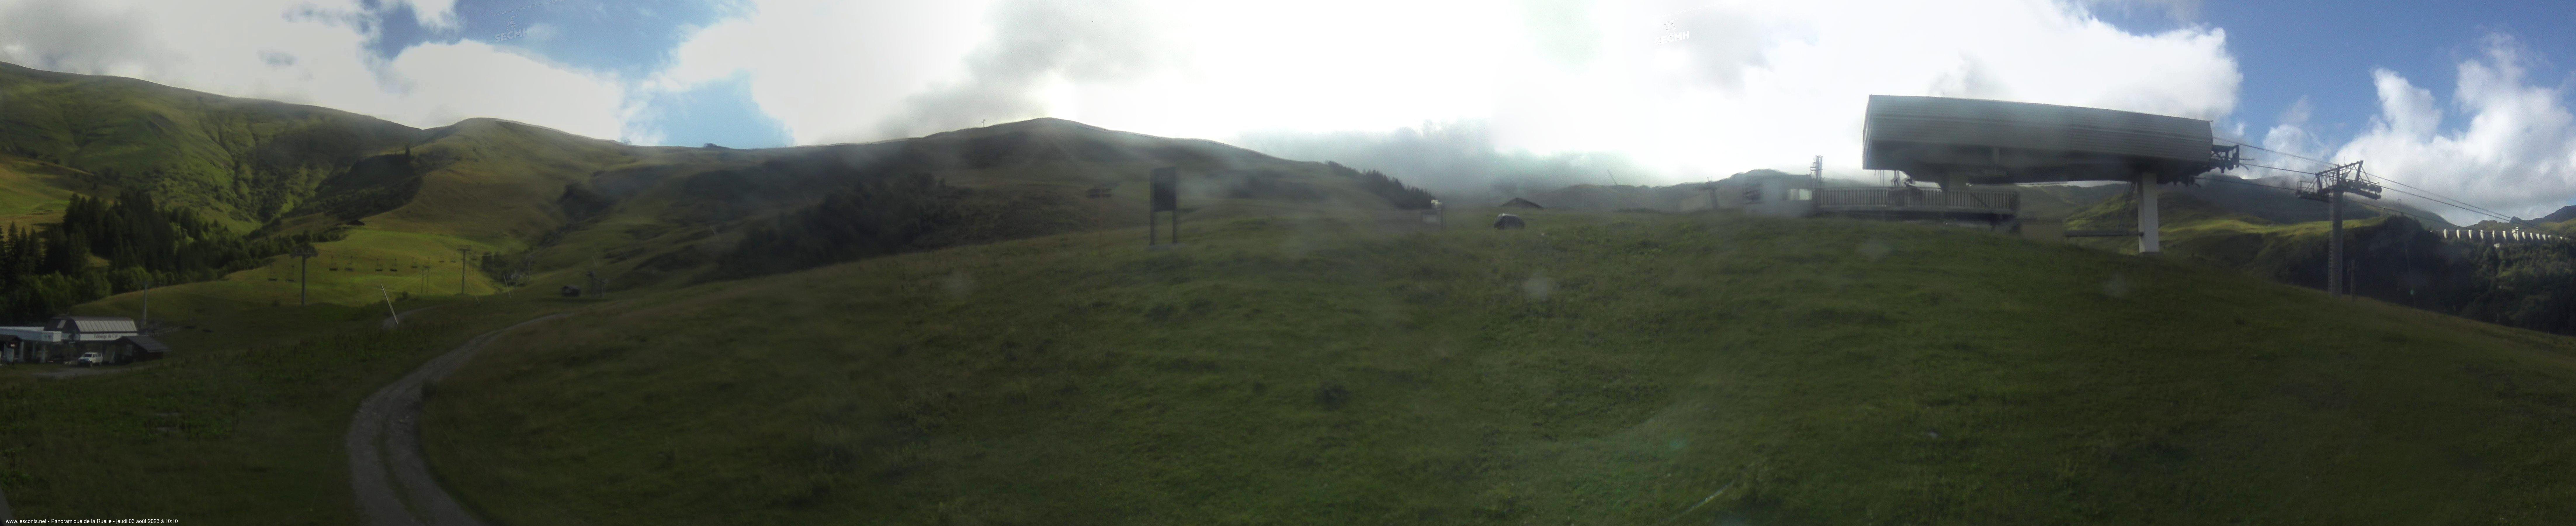 Les Contamines webcam - Ruelle ski station